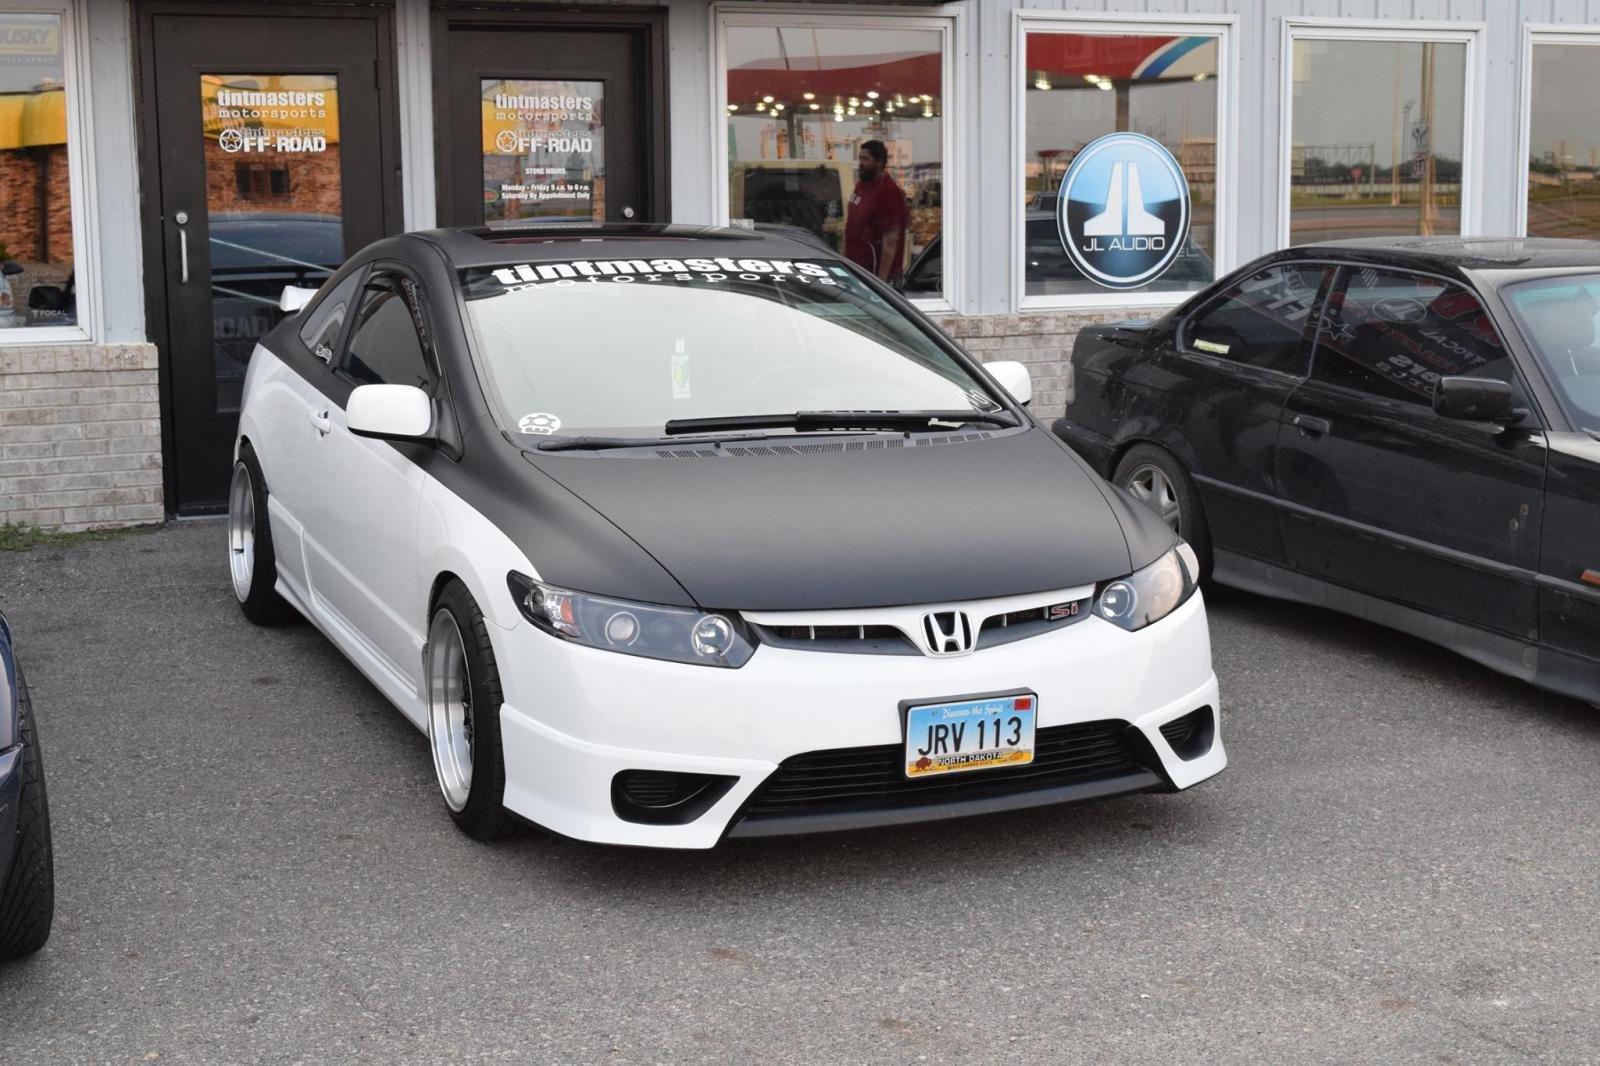 Vinyl Wrapped Civic 8th Generation Honda Civic Forum